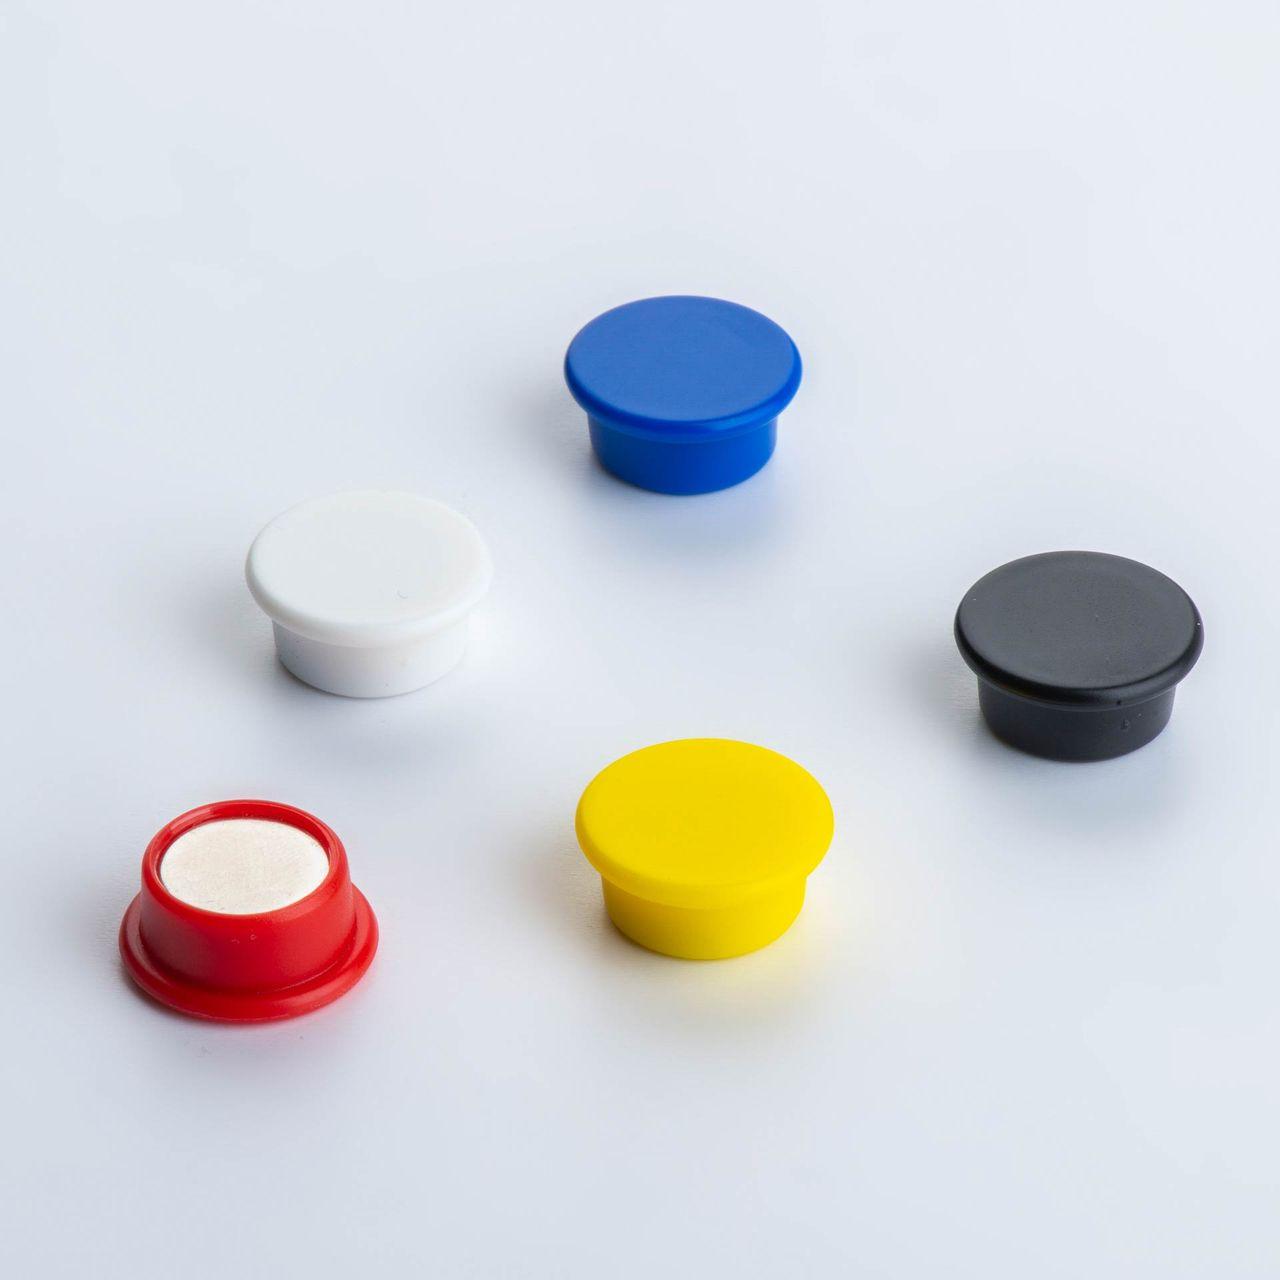 Office magnet made of NdFeB with round plastic housing, coloured, thyssenkrupp Magnettechnik